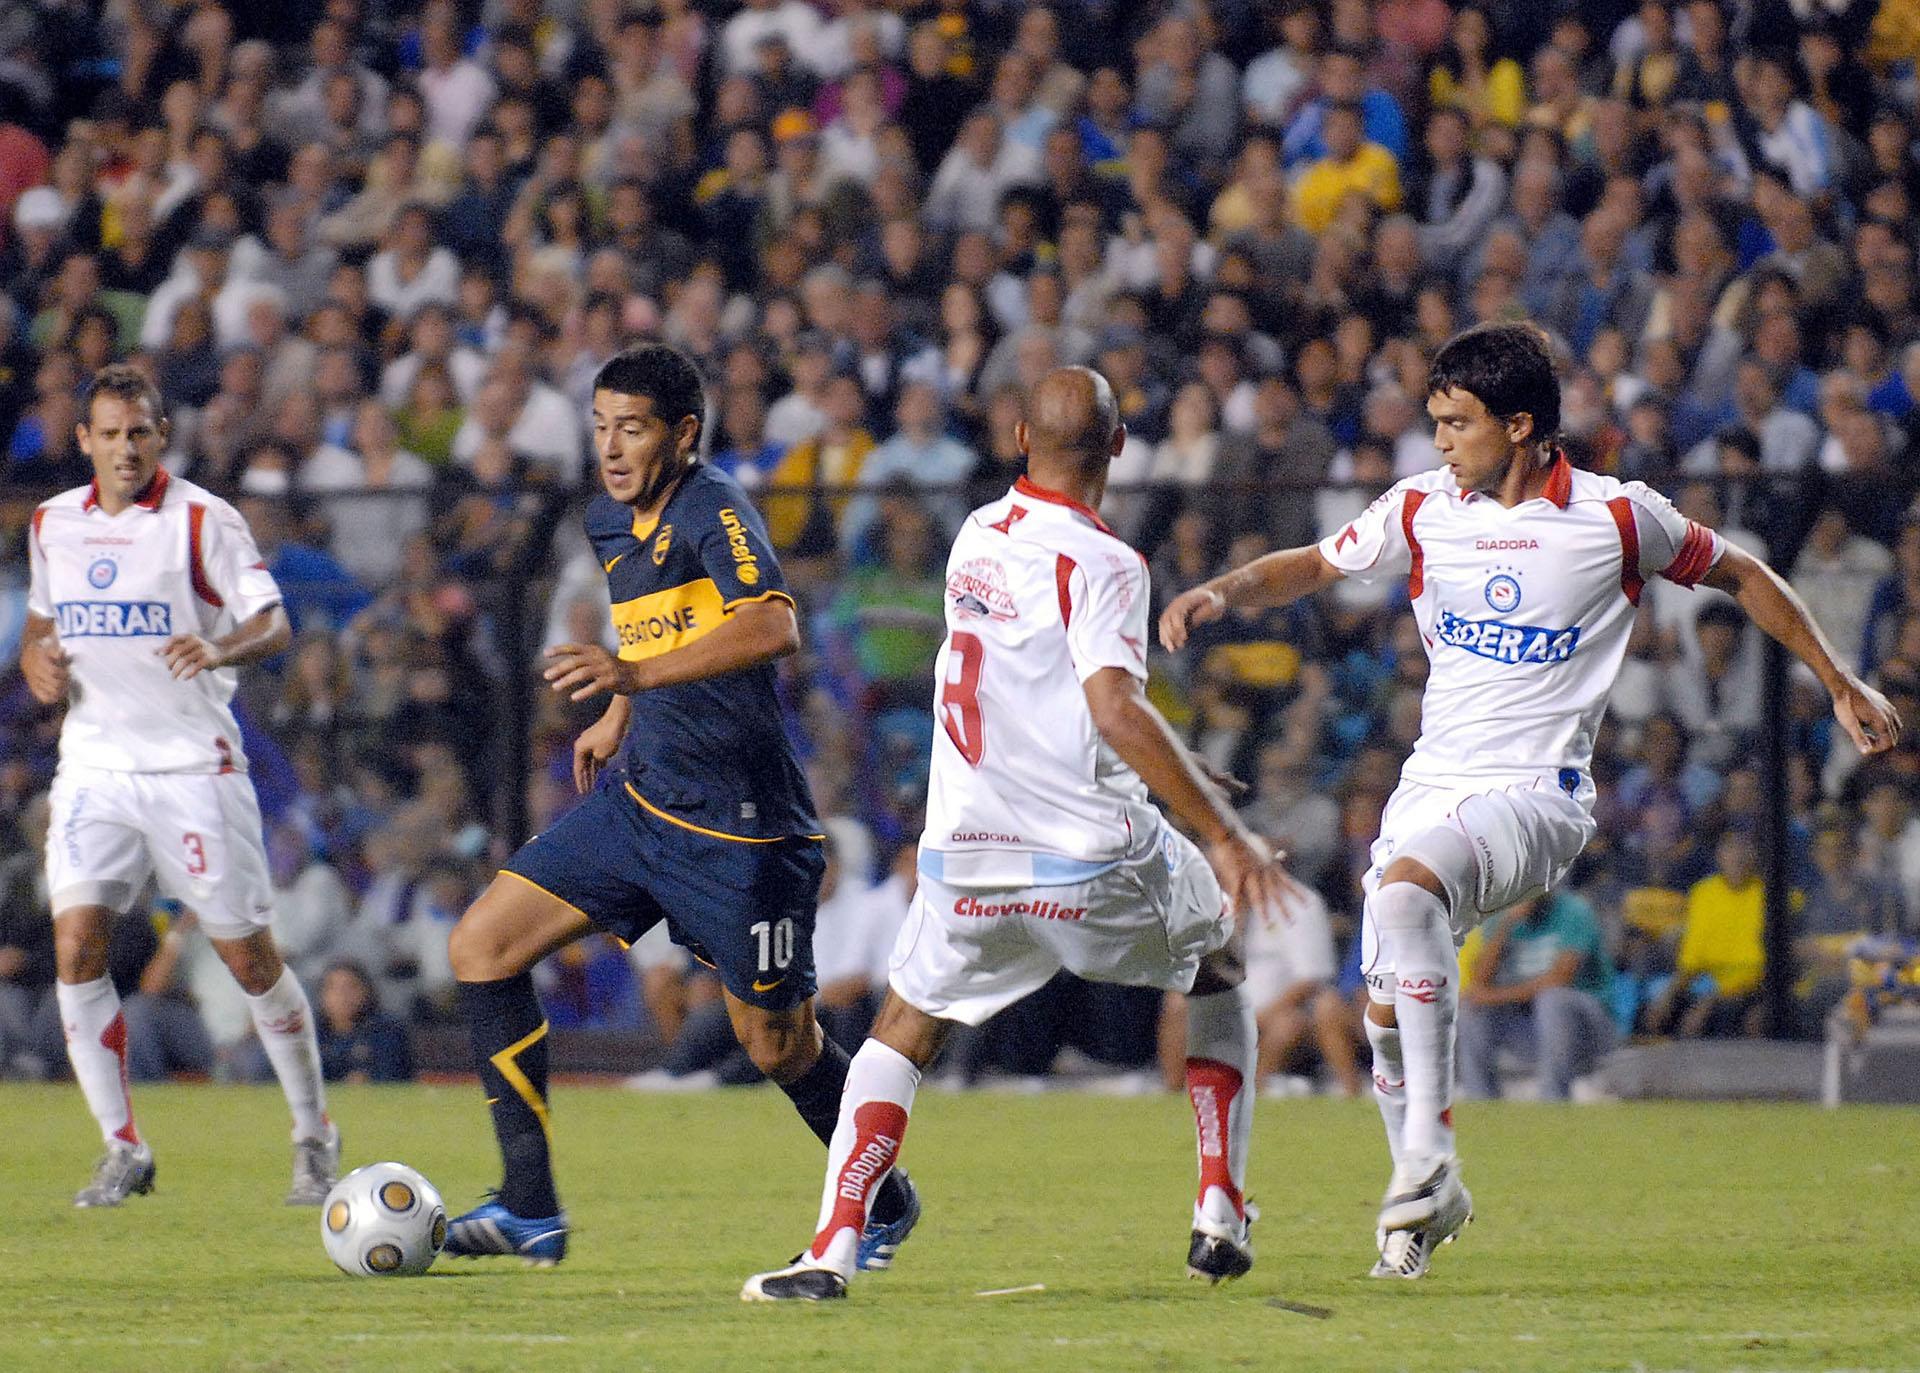 Con la camiseta de Boca le tocó enfrentar se a Argentinos Juniors (NA)